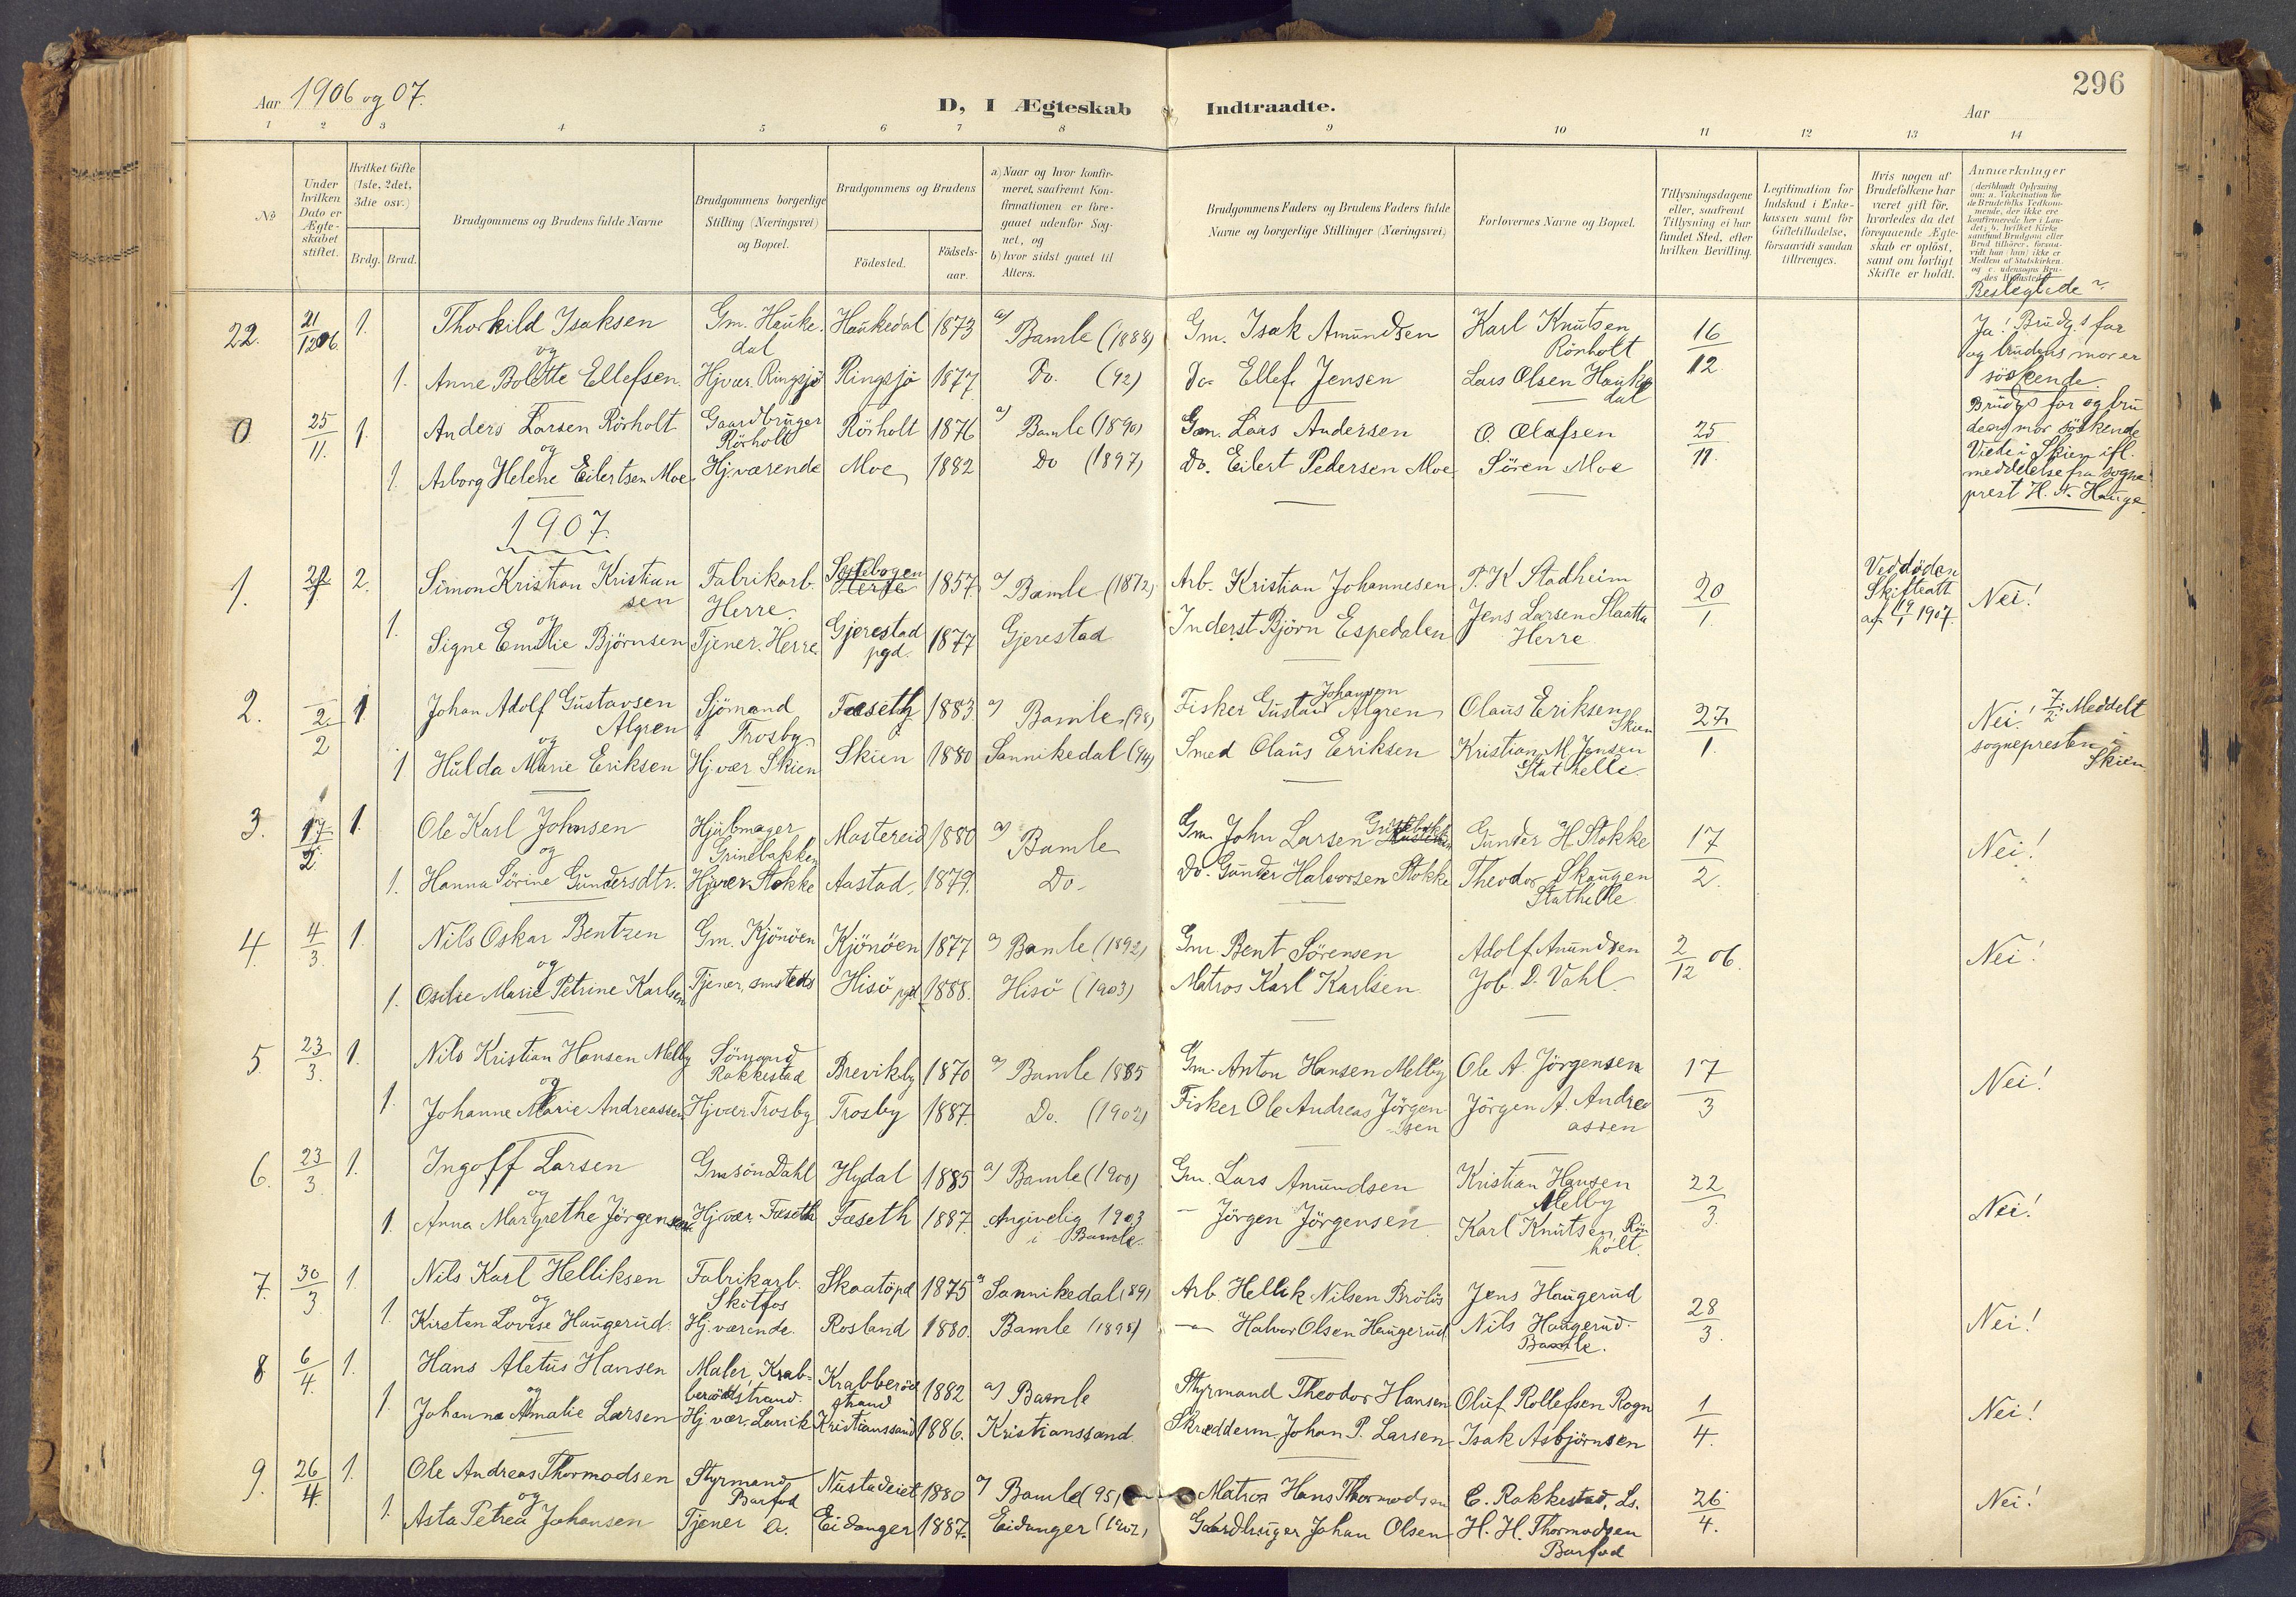 SAKO, Bamble kirkebøker, F/Fa/L0009: Ministerialbok nr. I 9, 1901-1917, s. 296